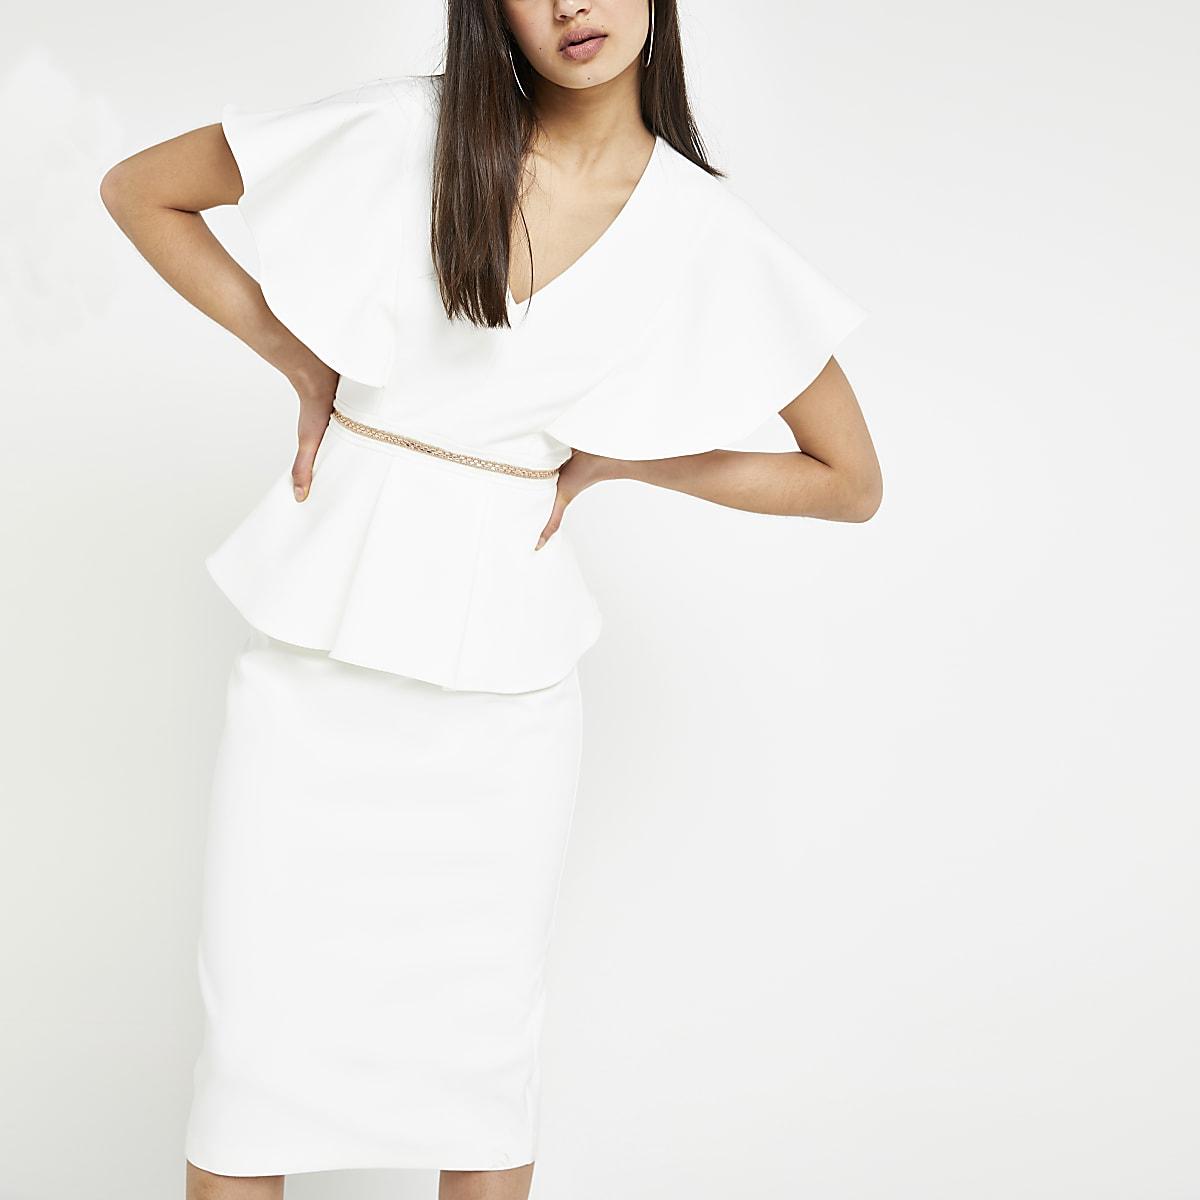 White peplum bodycon dress